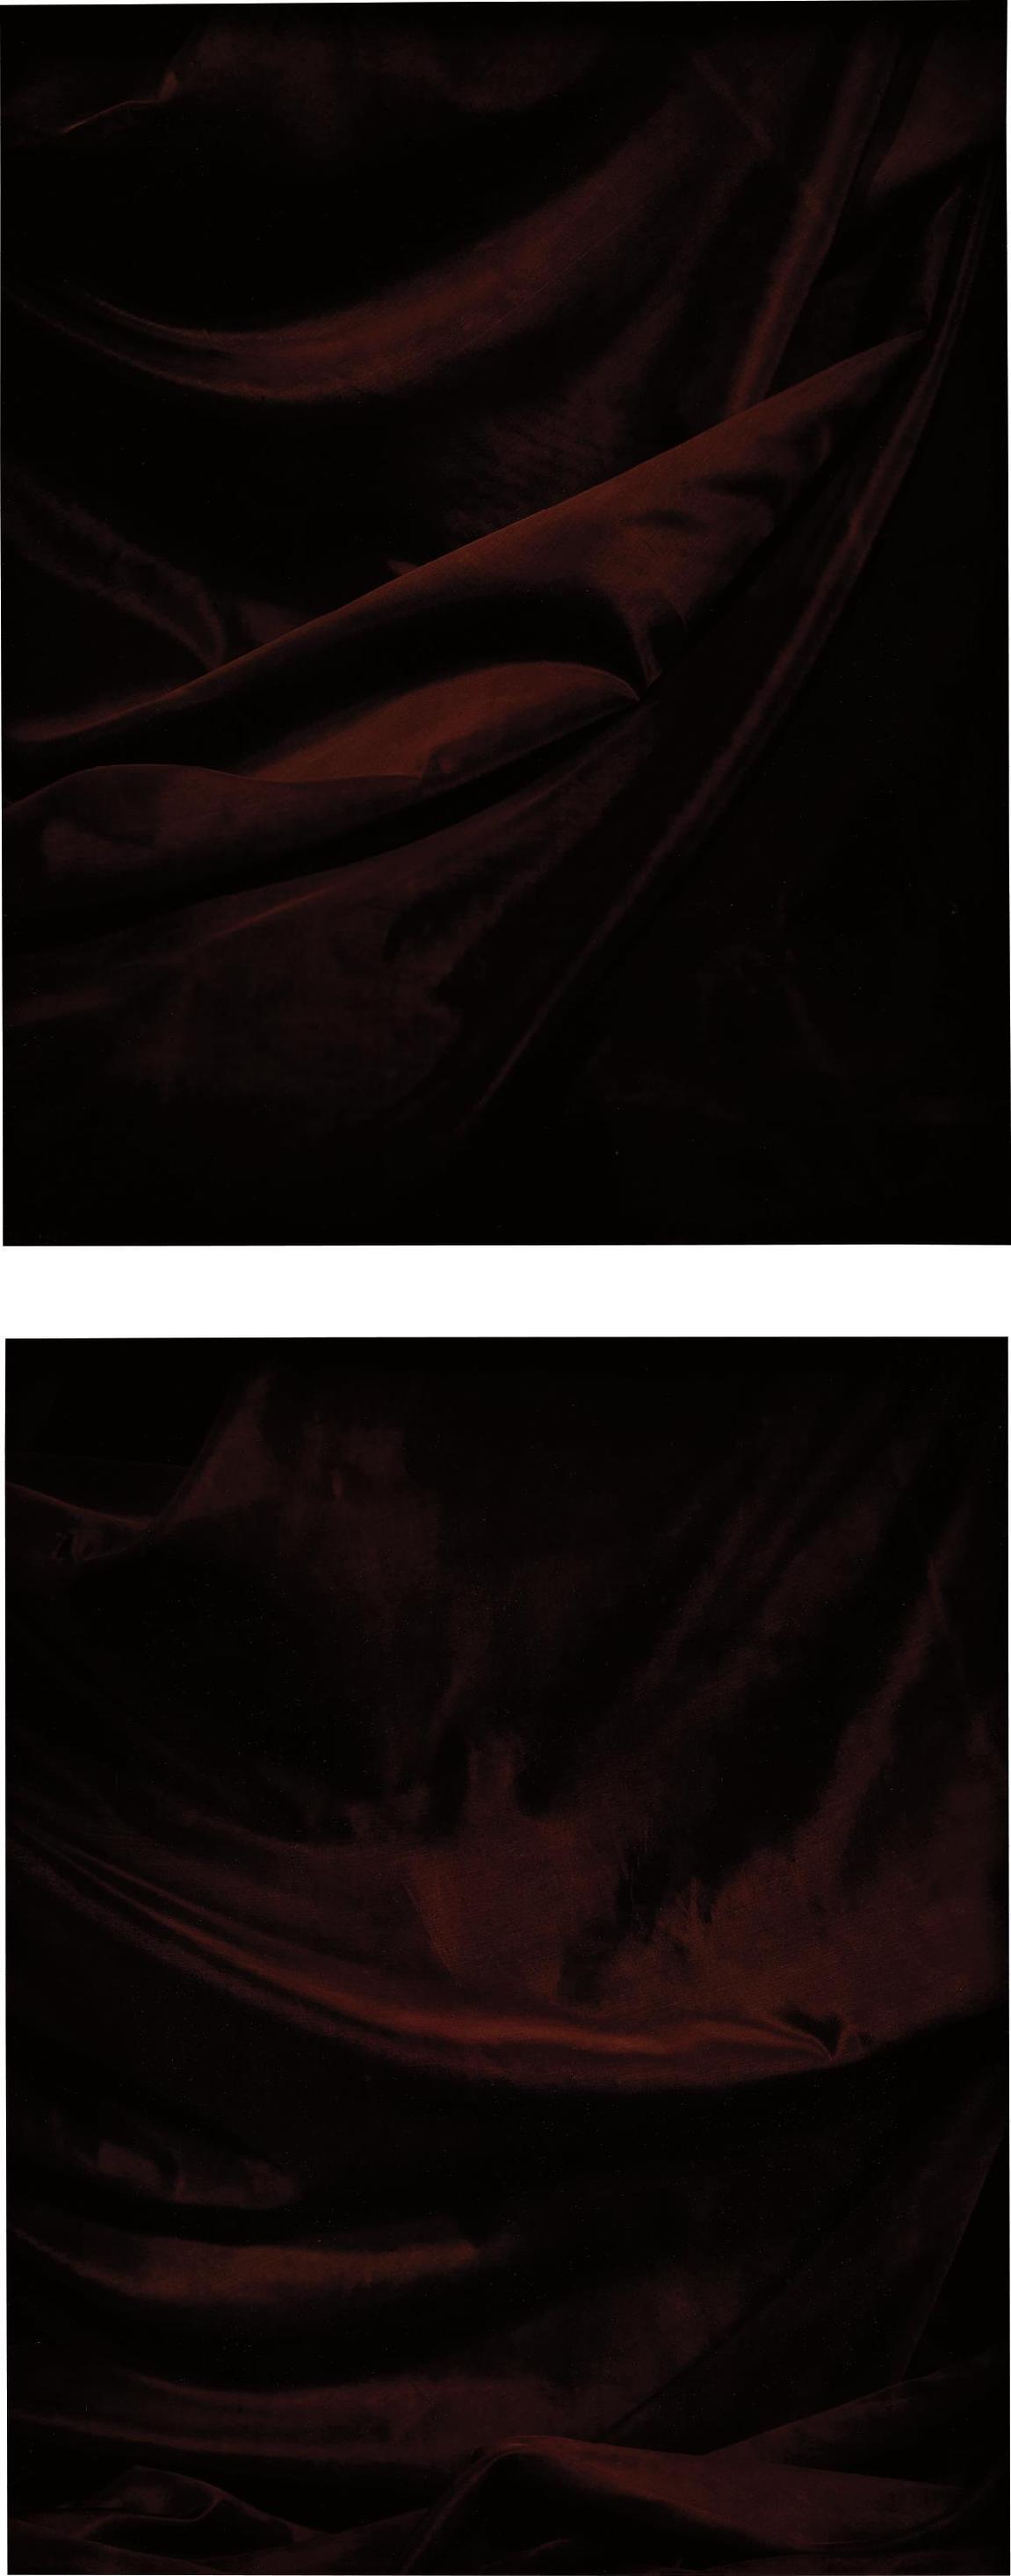 James Welling-Two Works: (I) X; (II) VIII-2008